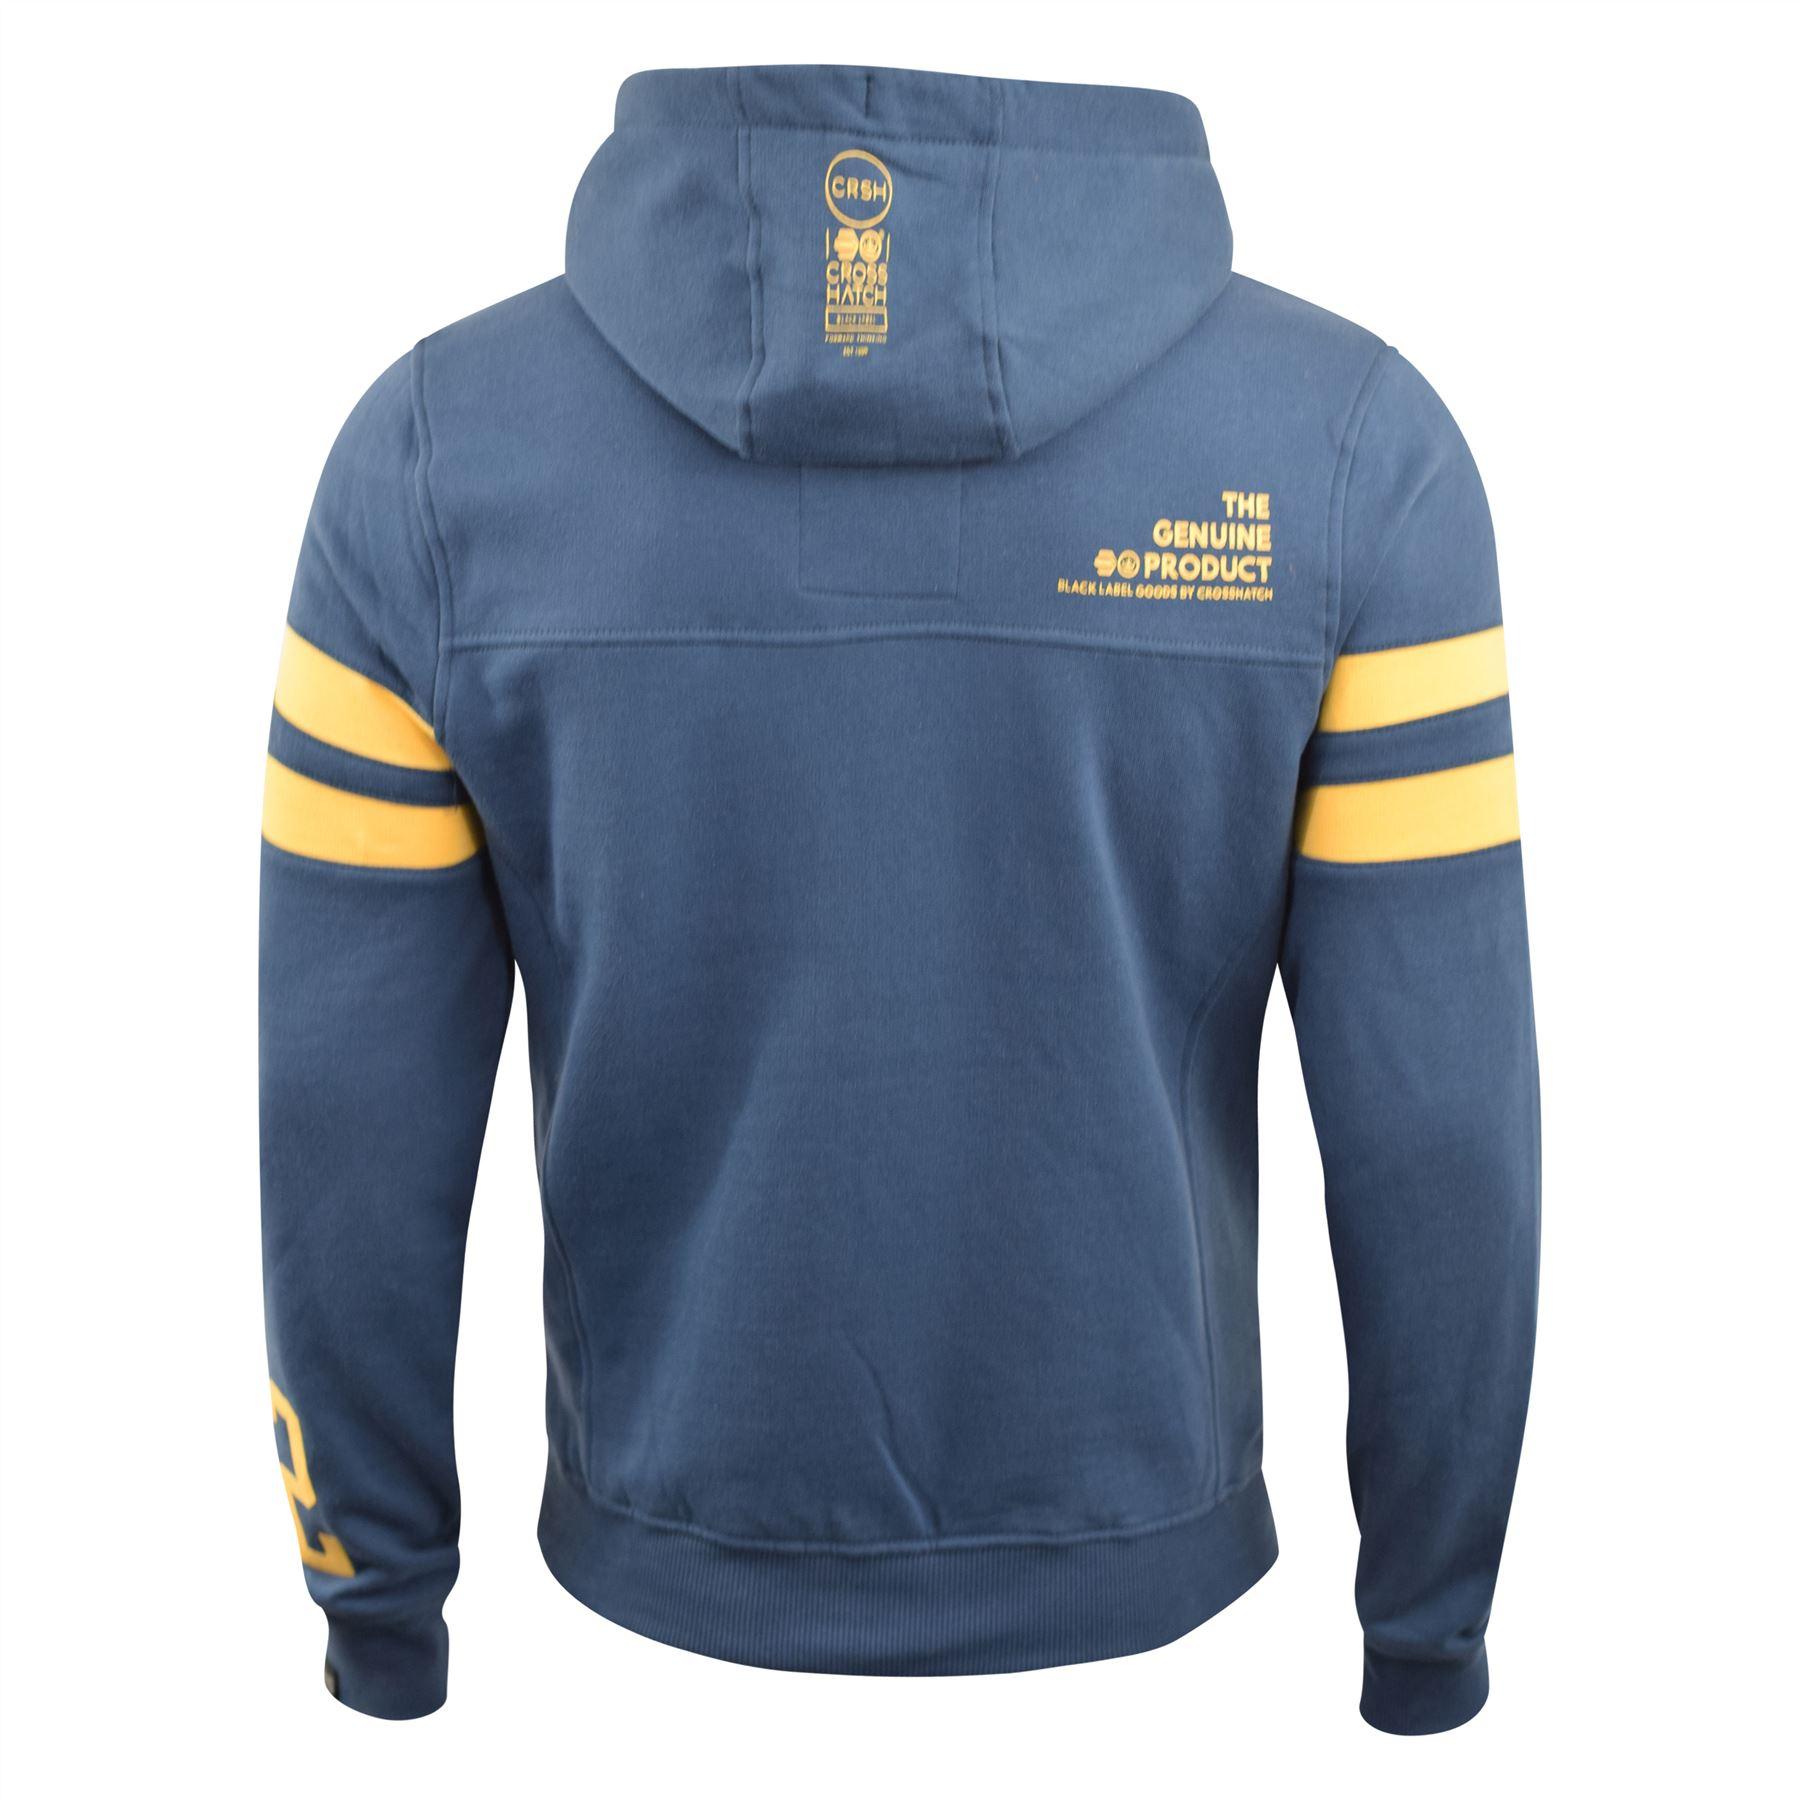 Mens-Hoodie-Crosshatch-Clothing-Sweatshirt-Hooded-Jumper-Top-Pullover-Cramform thumbnail 4